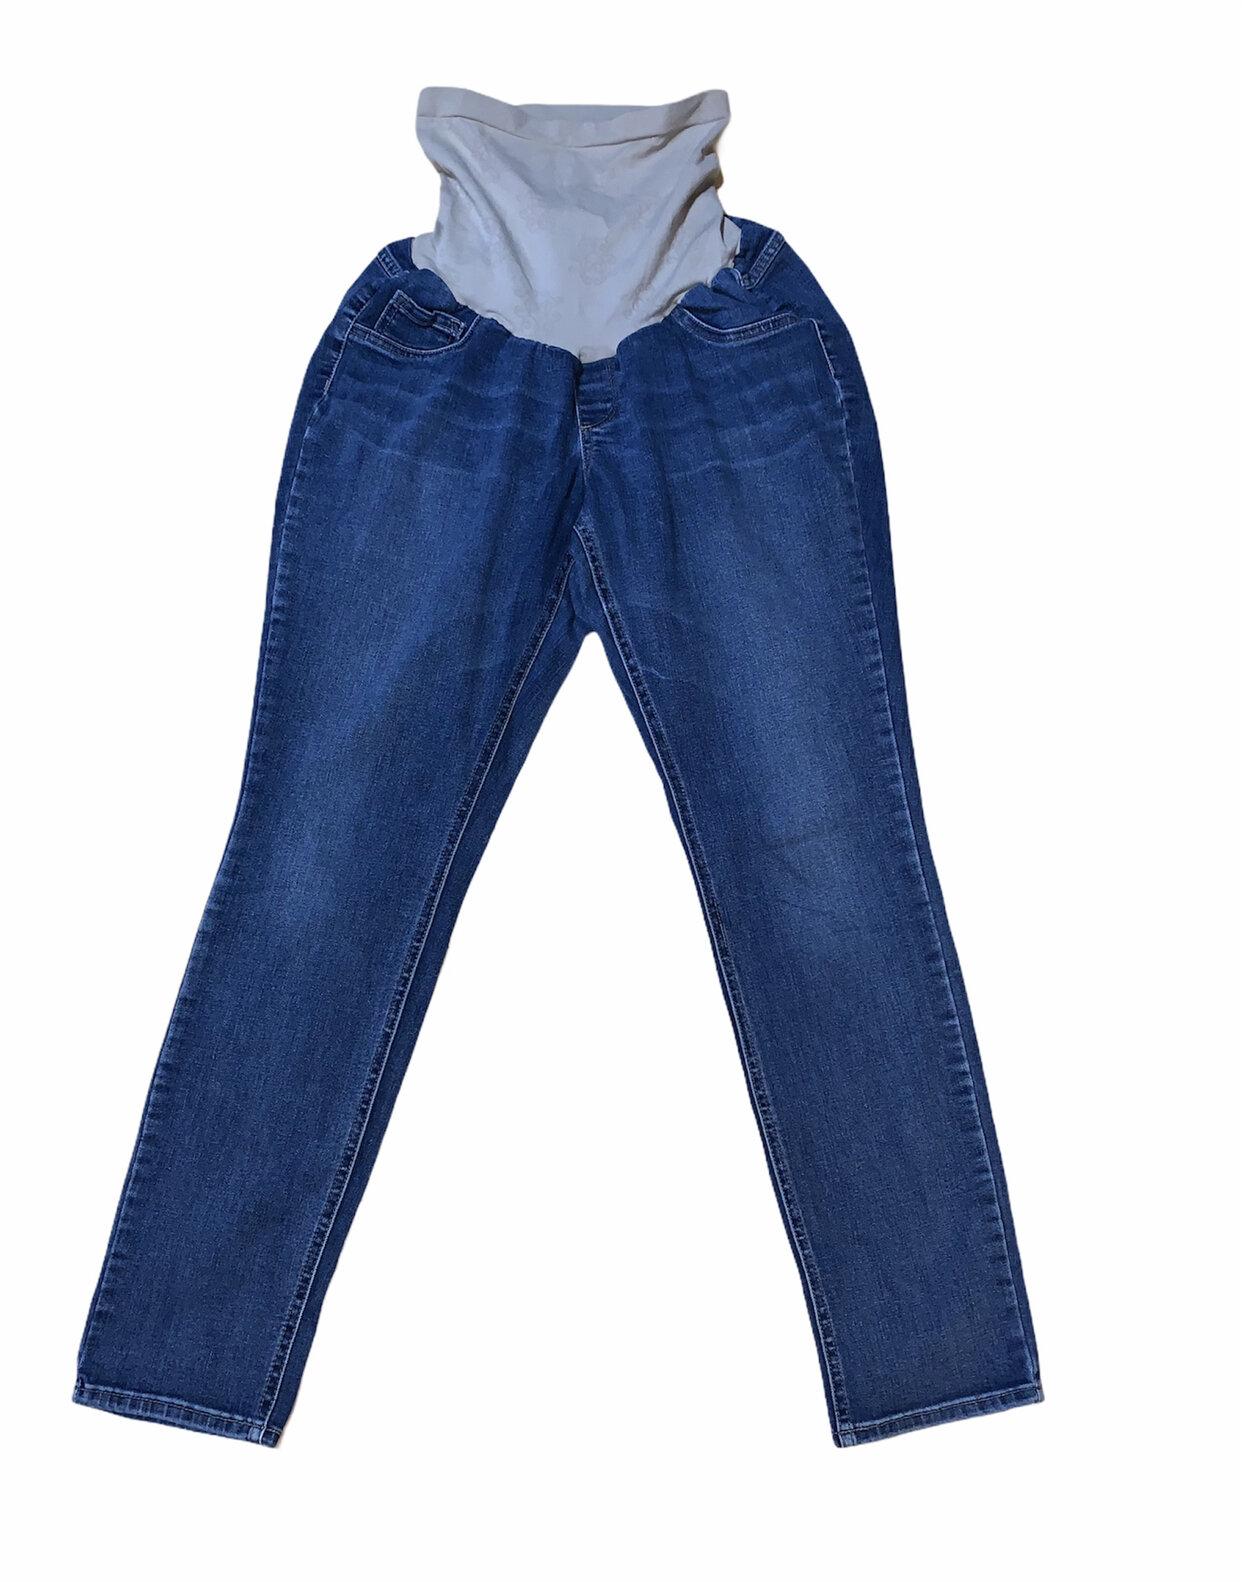 Jessica Simpson Maternity Straight Leg Jeans